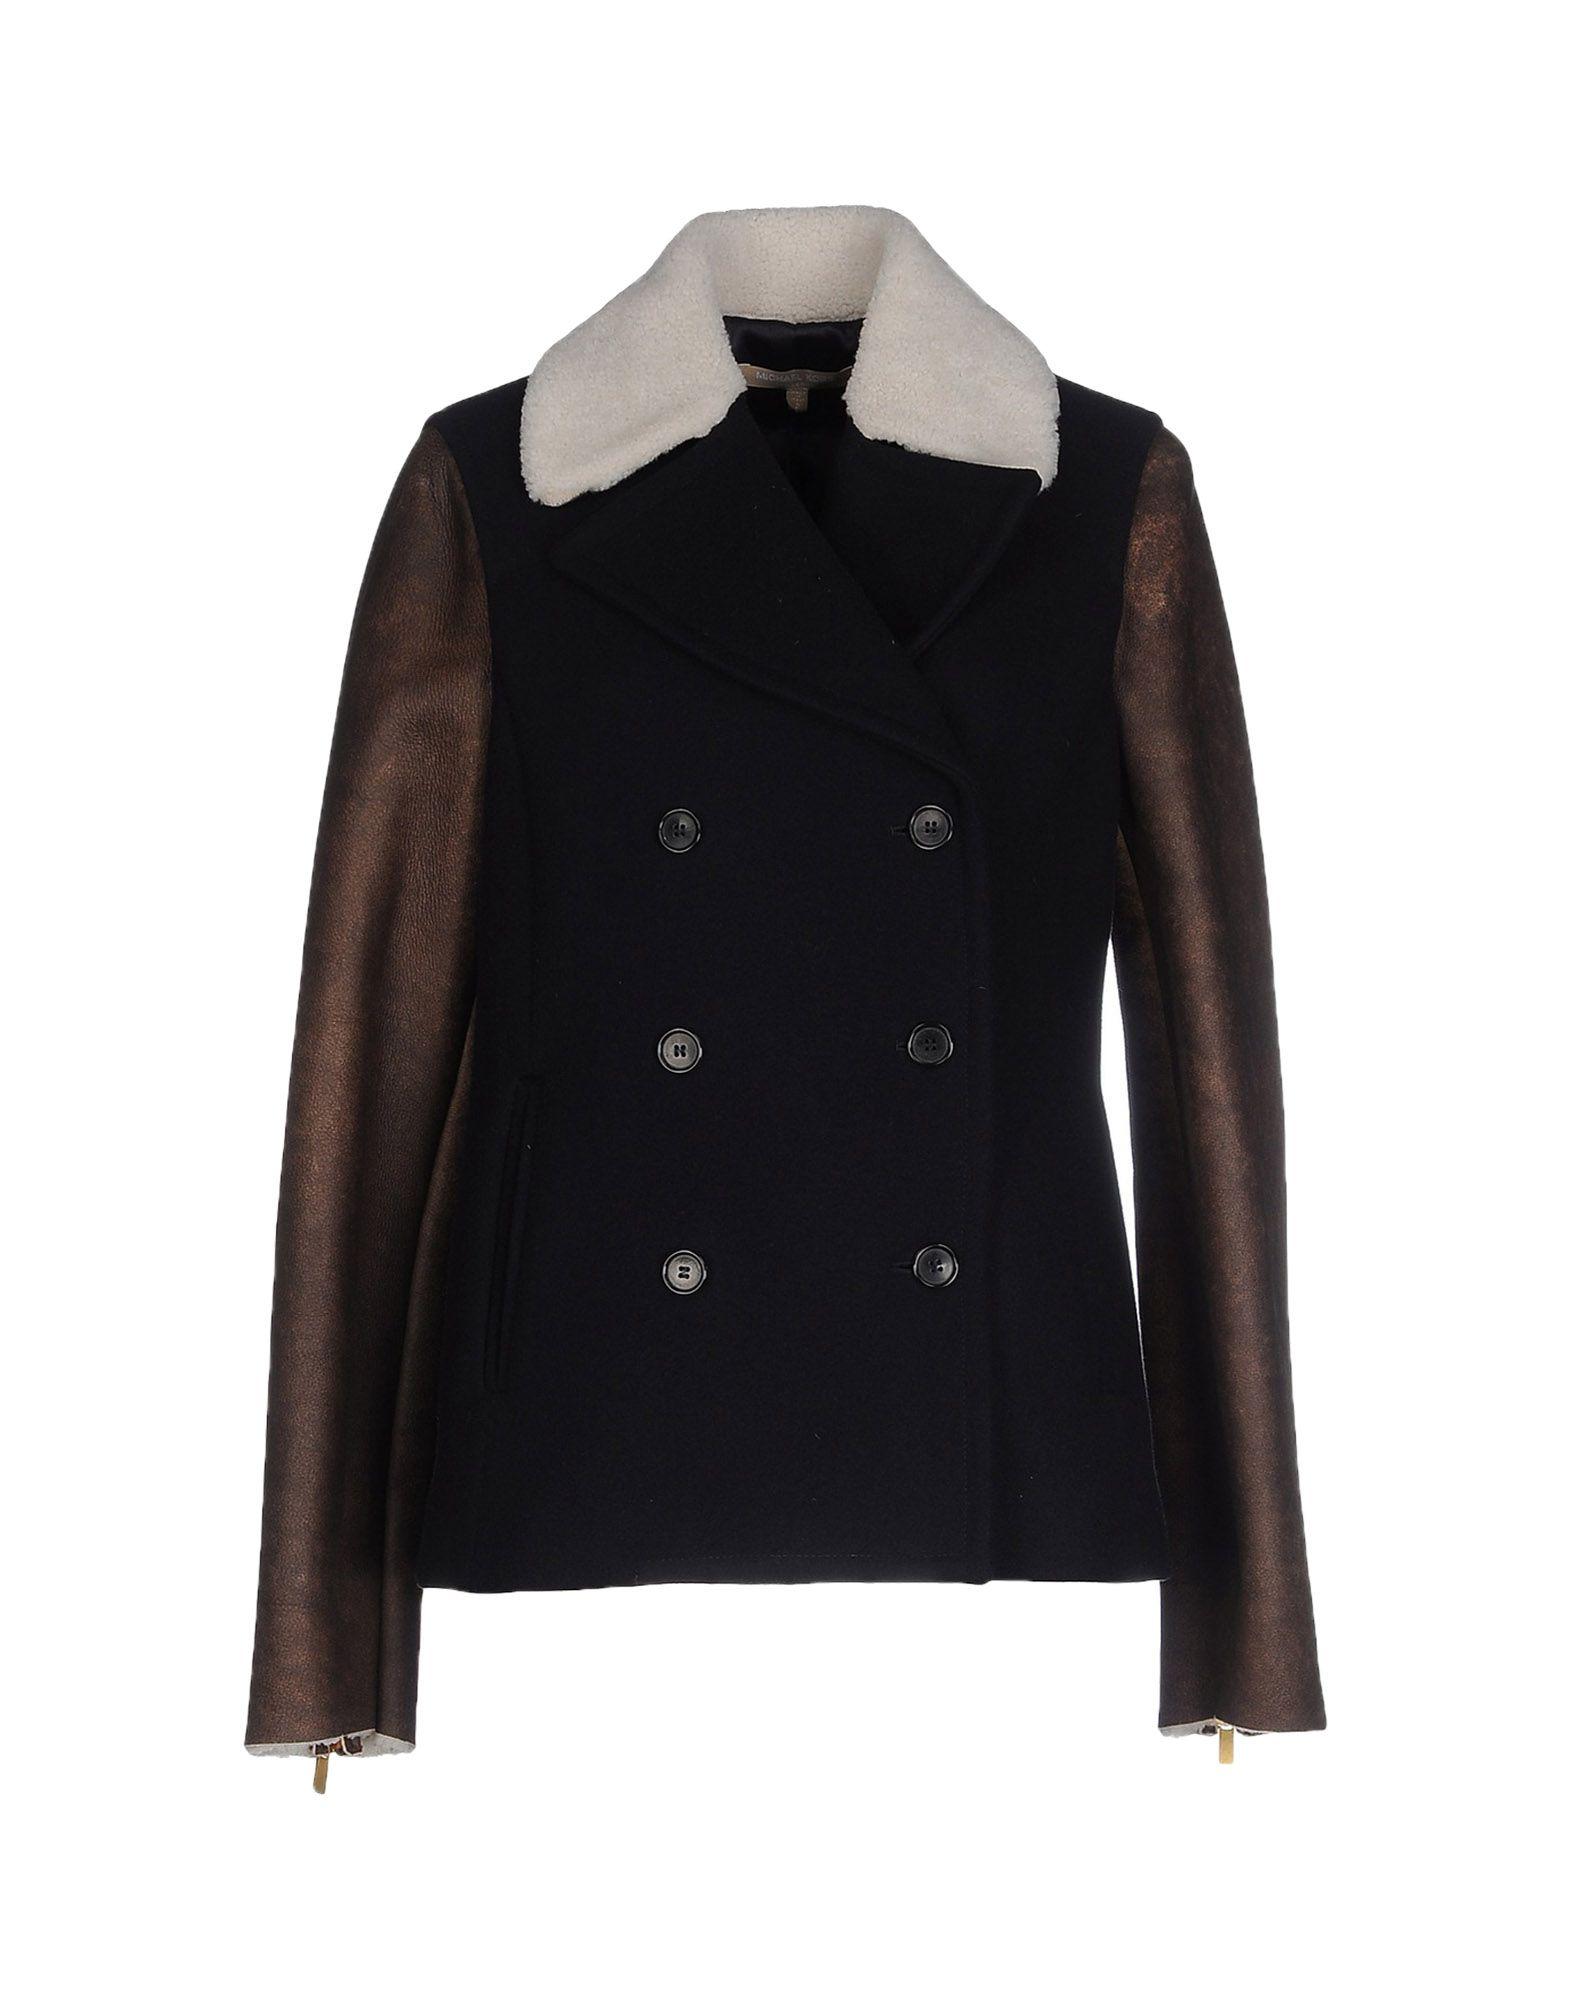 michael kors female michael kors jackets